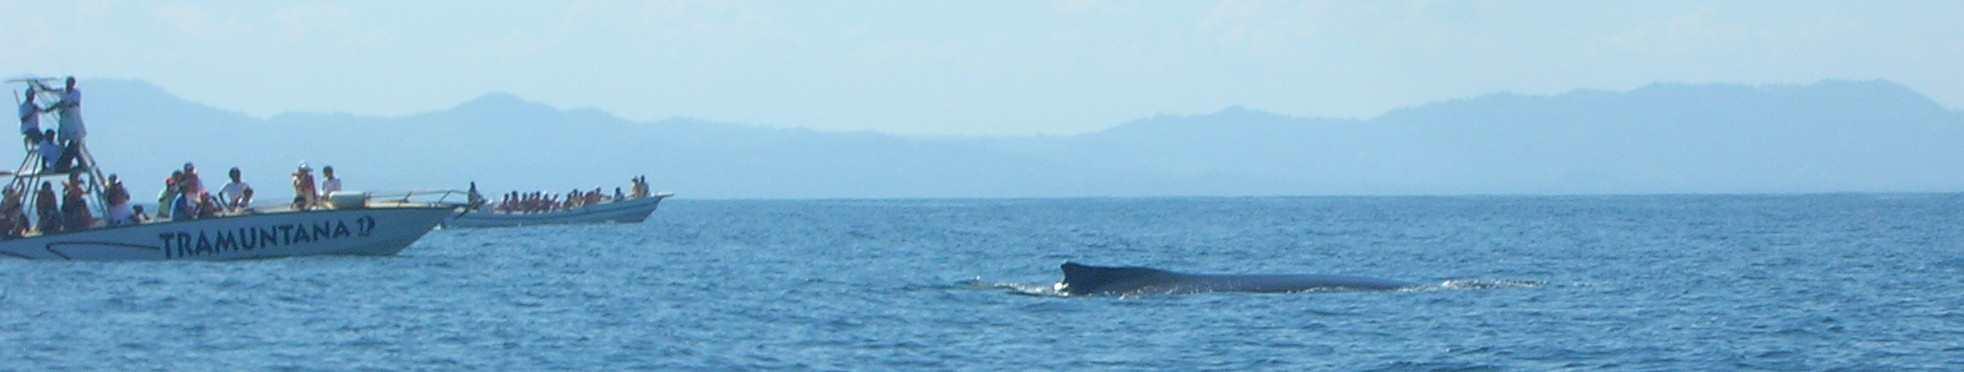 balena e mave di avvistamento baia di samanà